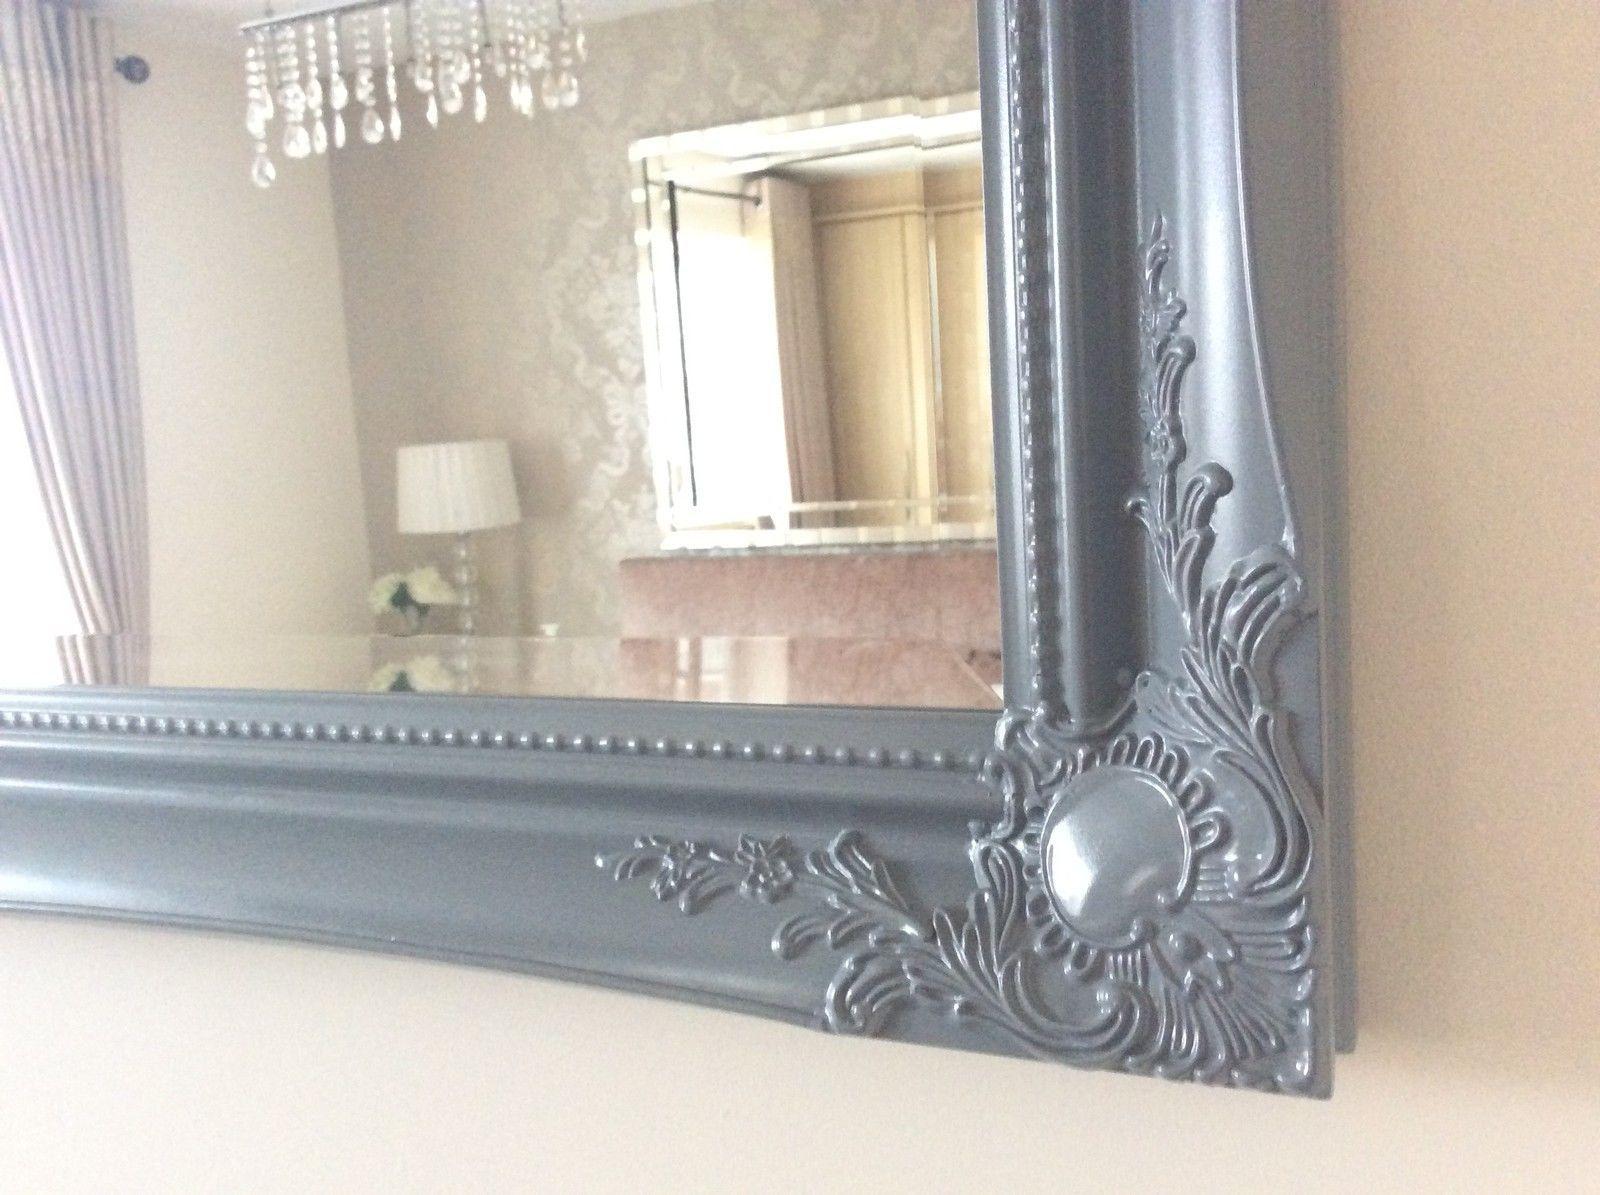 X LARGE Grey Satin Shabby Chic Ornate Decorative Wall